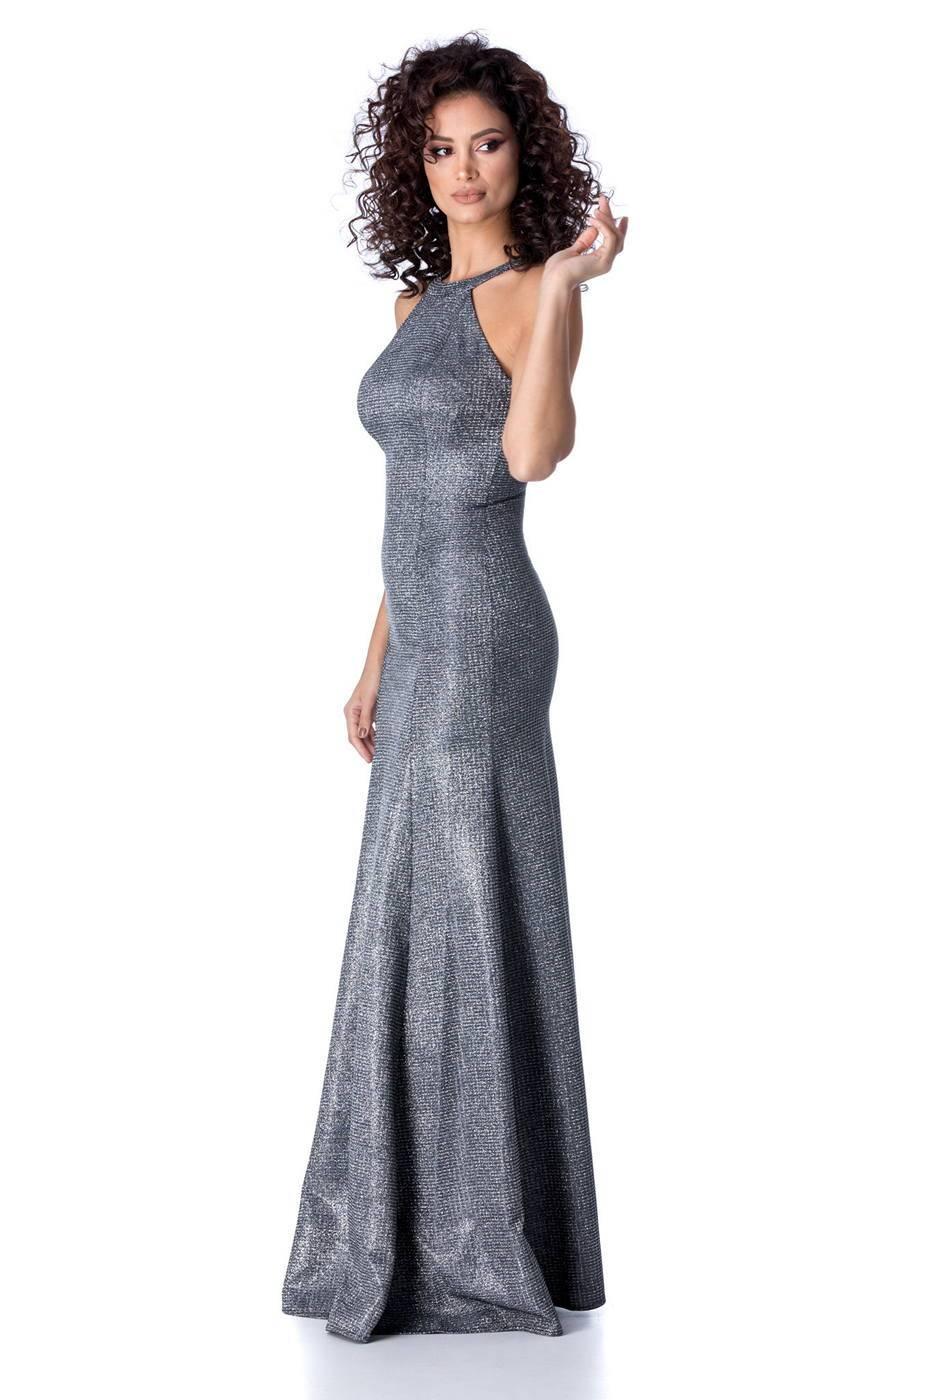 Valore Ασημί Φόρεμα 2257